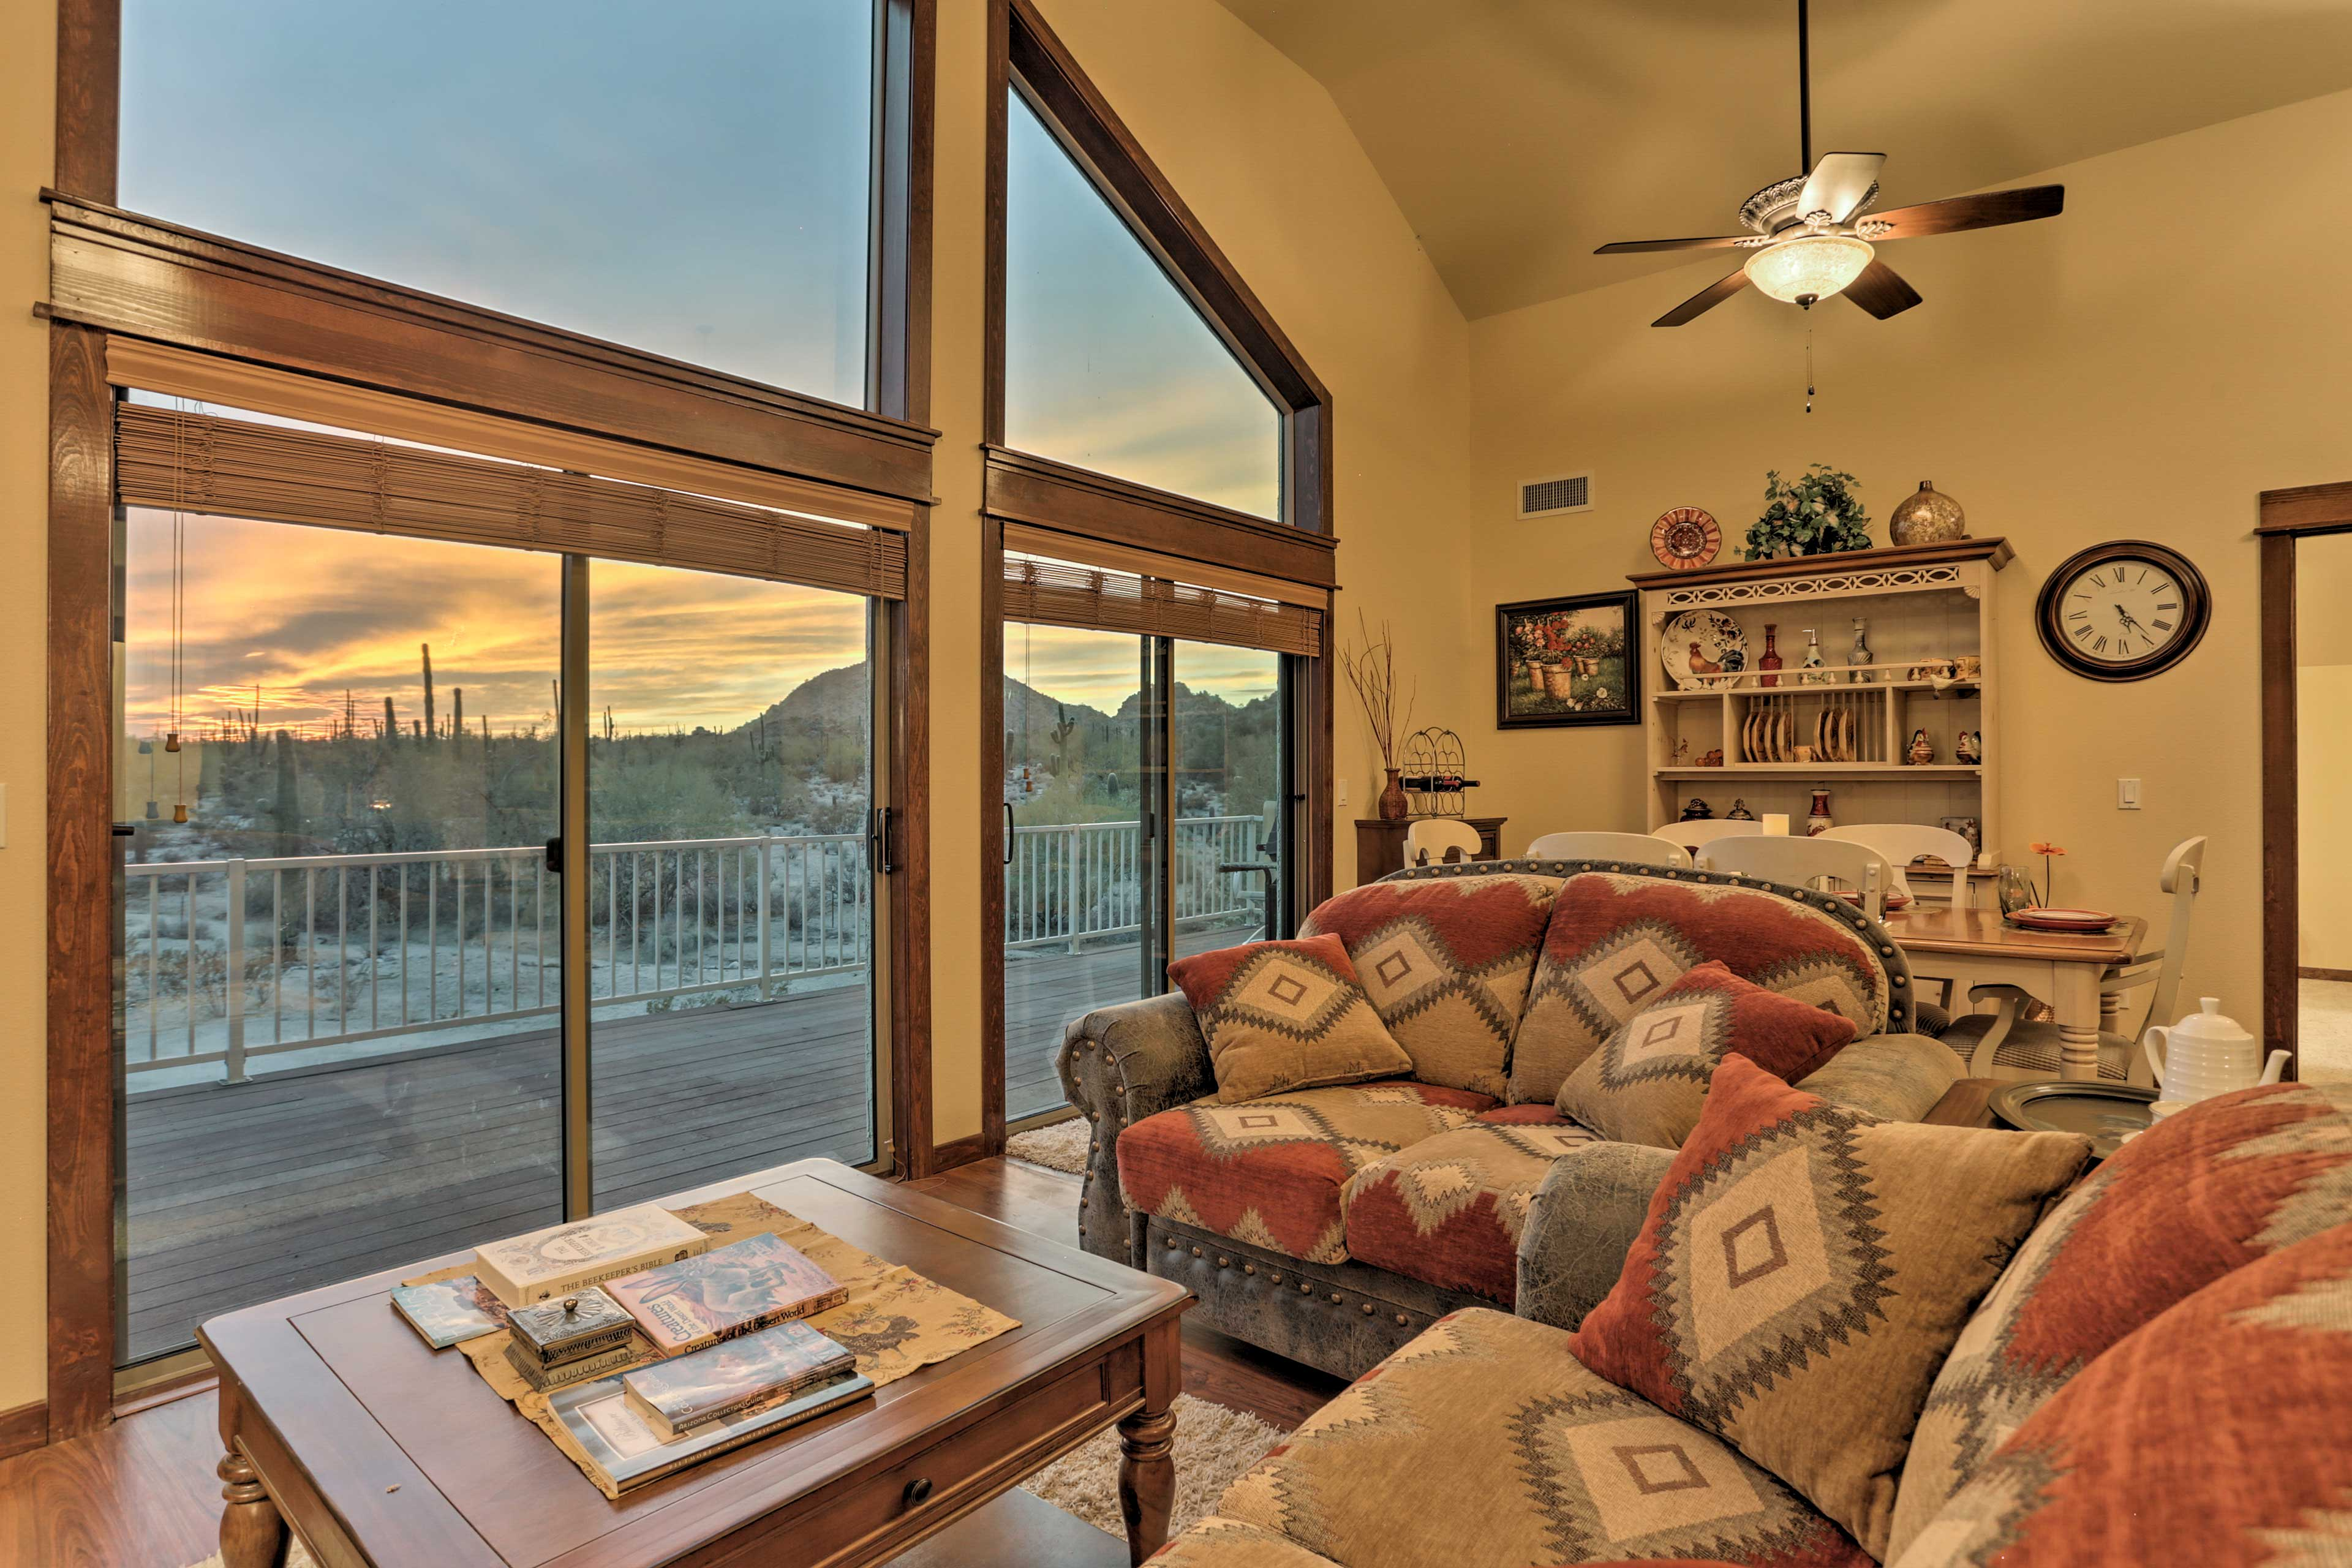 A true desert getaway awaits at this quaint Maricopa vacation rental condo!